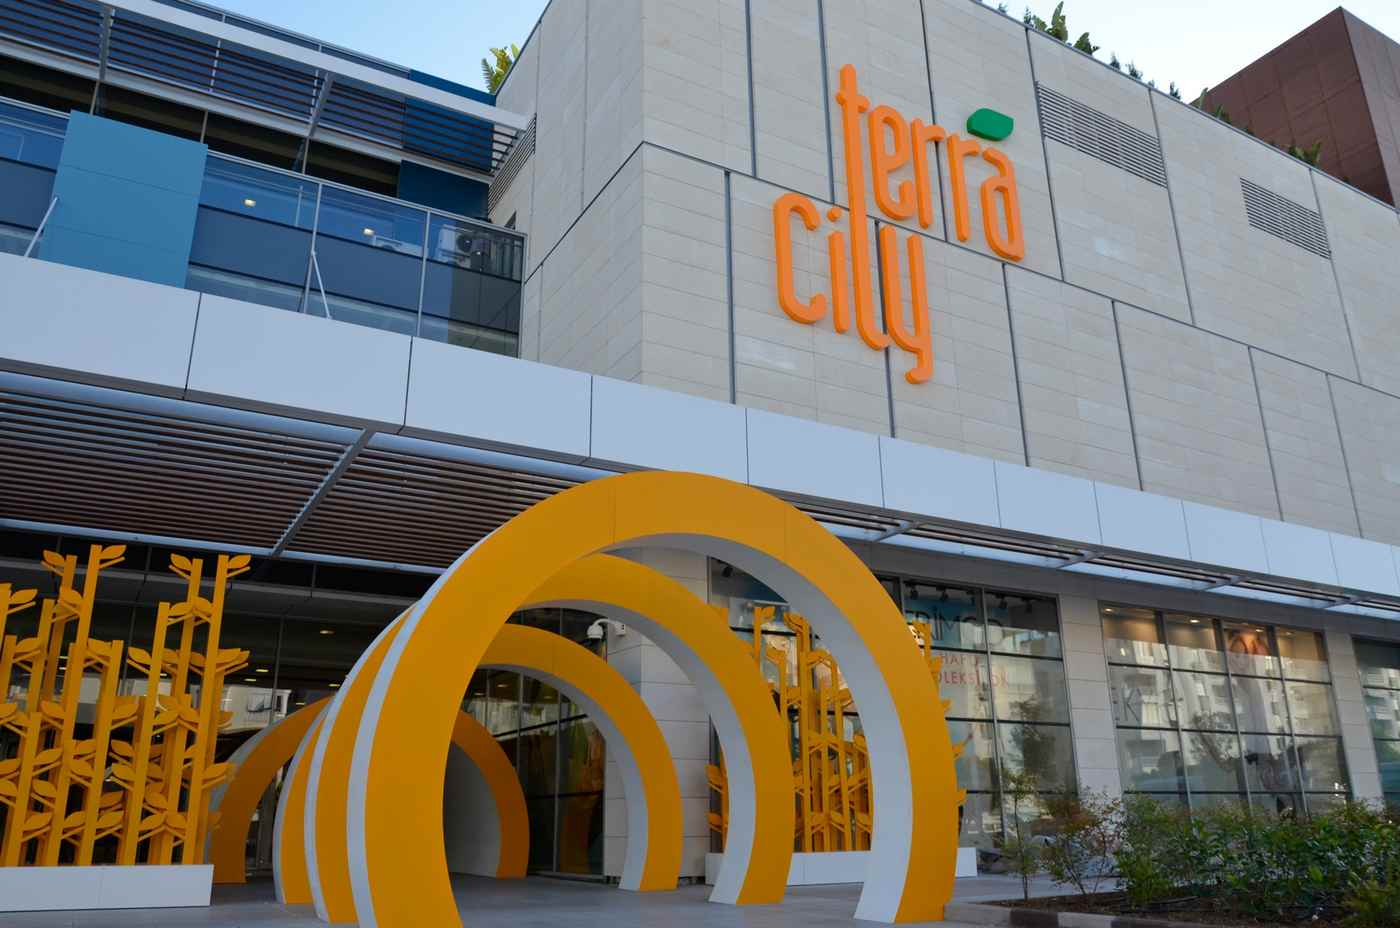 مركز تسوق تيرا سيتي انطاليا تركيا